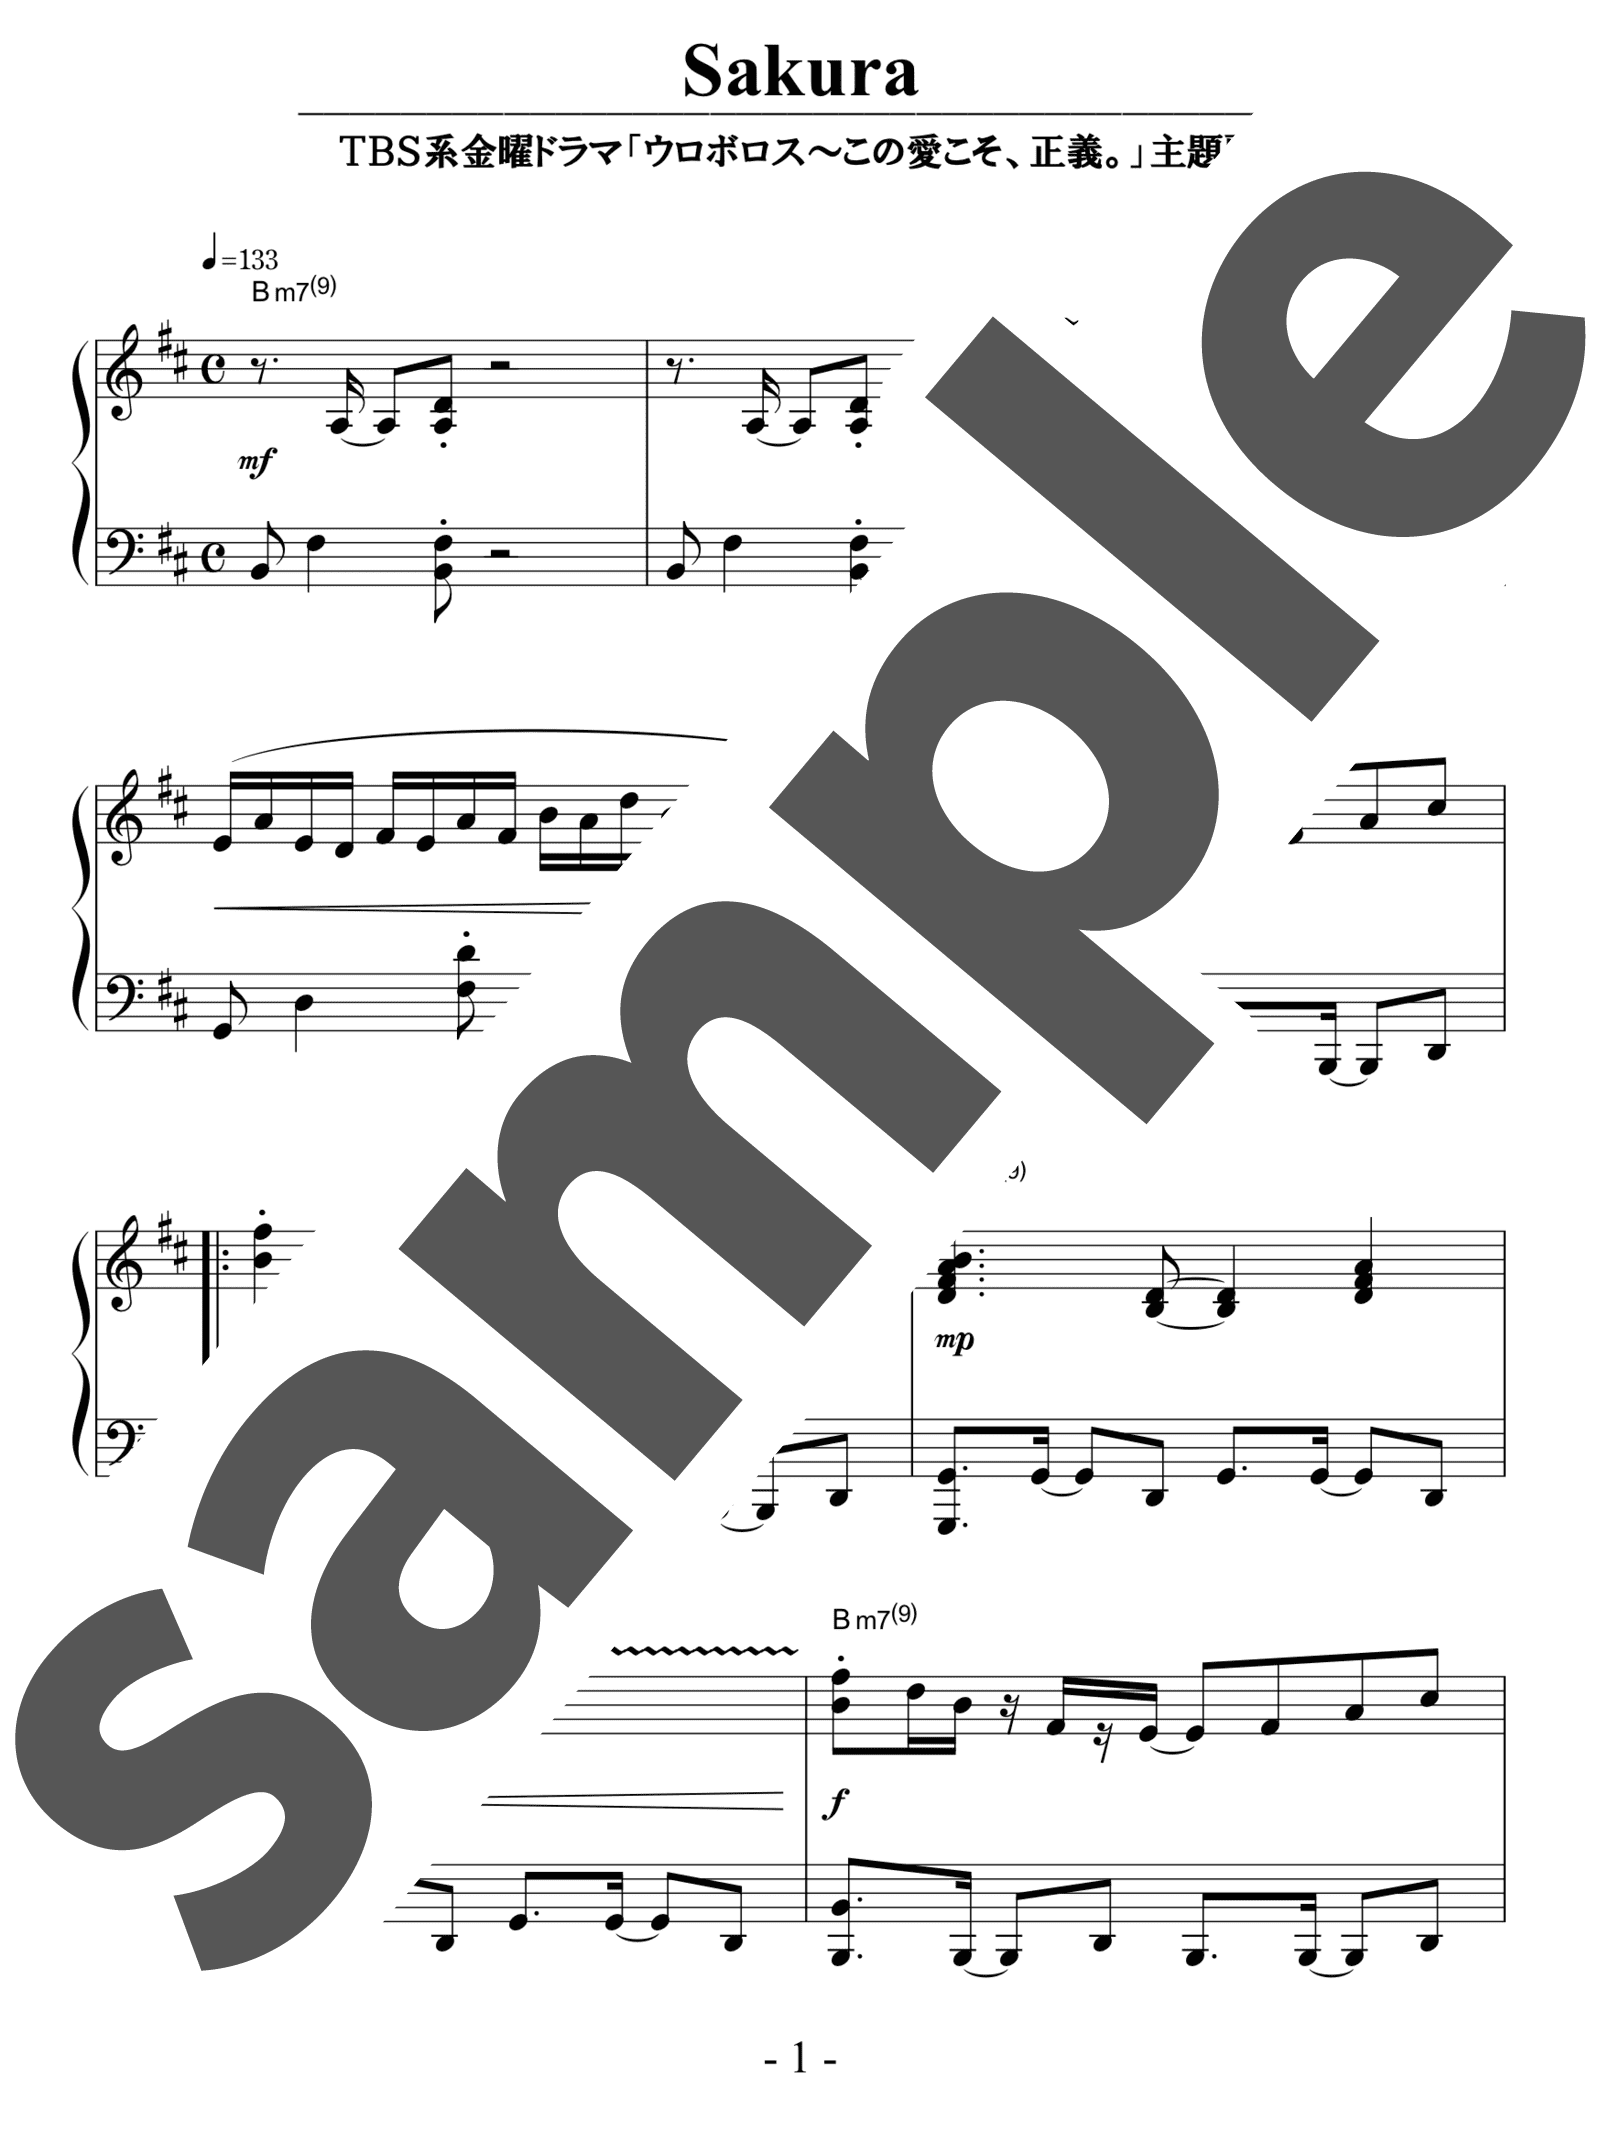 「Sakura」のサンプル楽譜